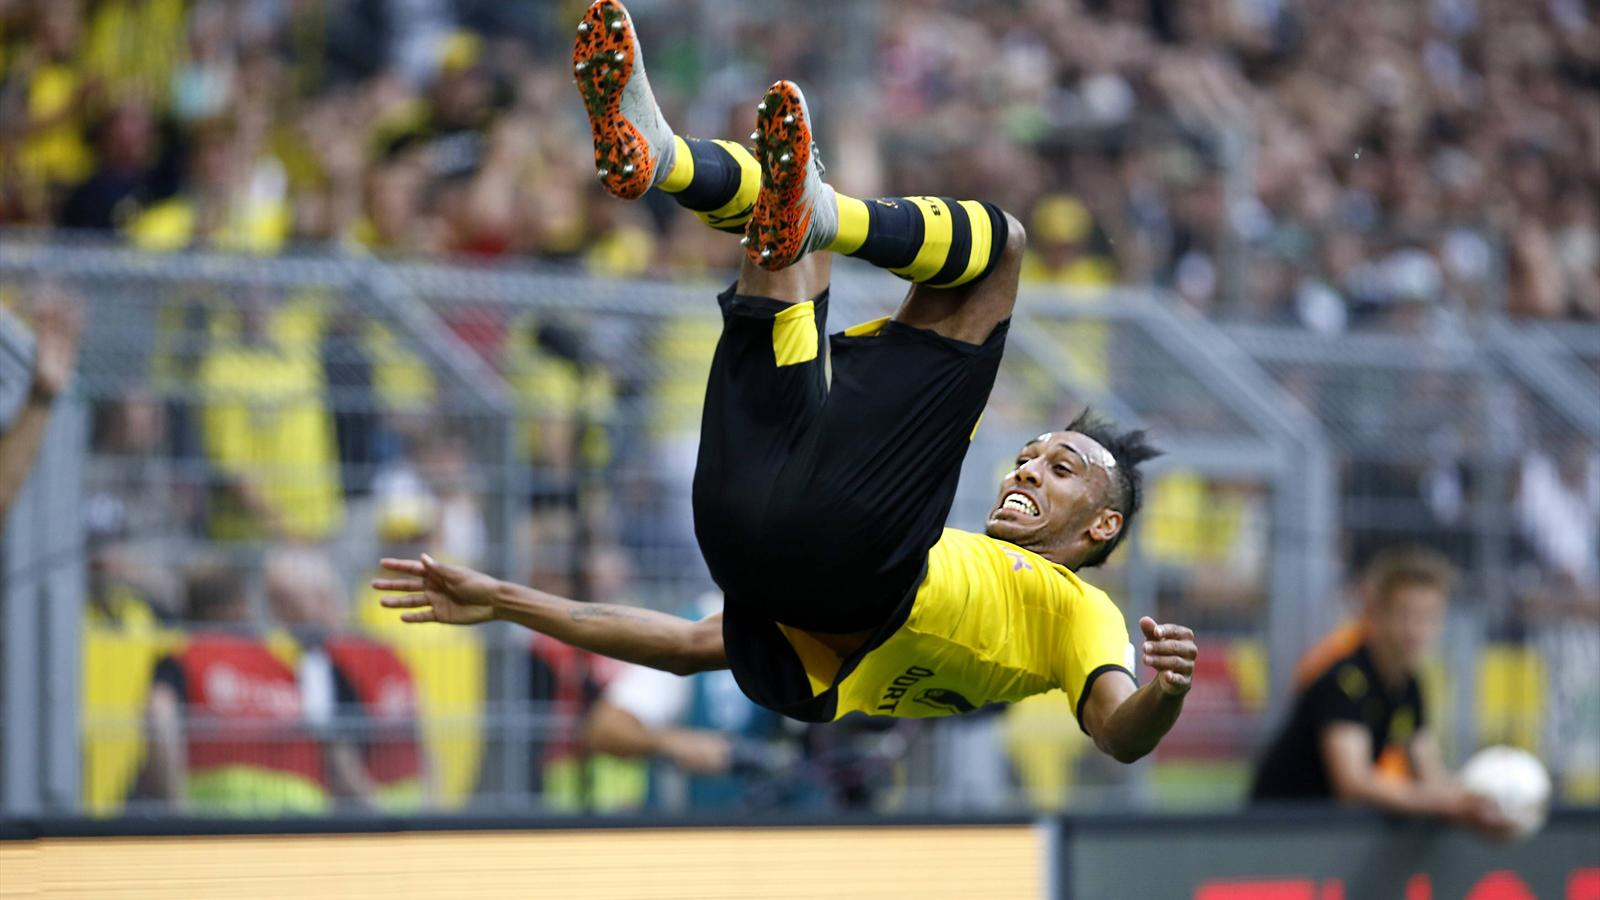 Pierre-Emerick Aubameyang buteur lors de Dortmund-Mönchengladbach